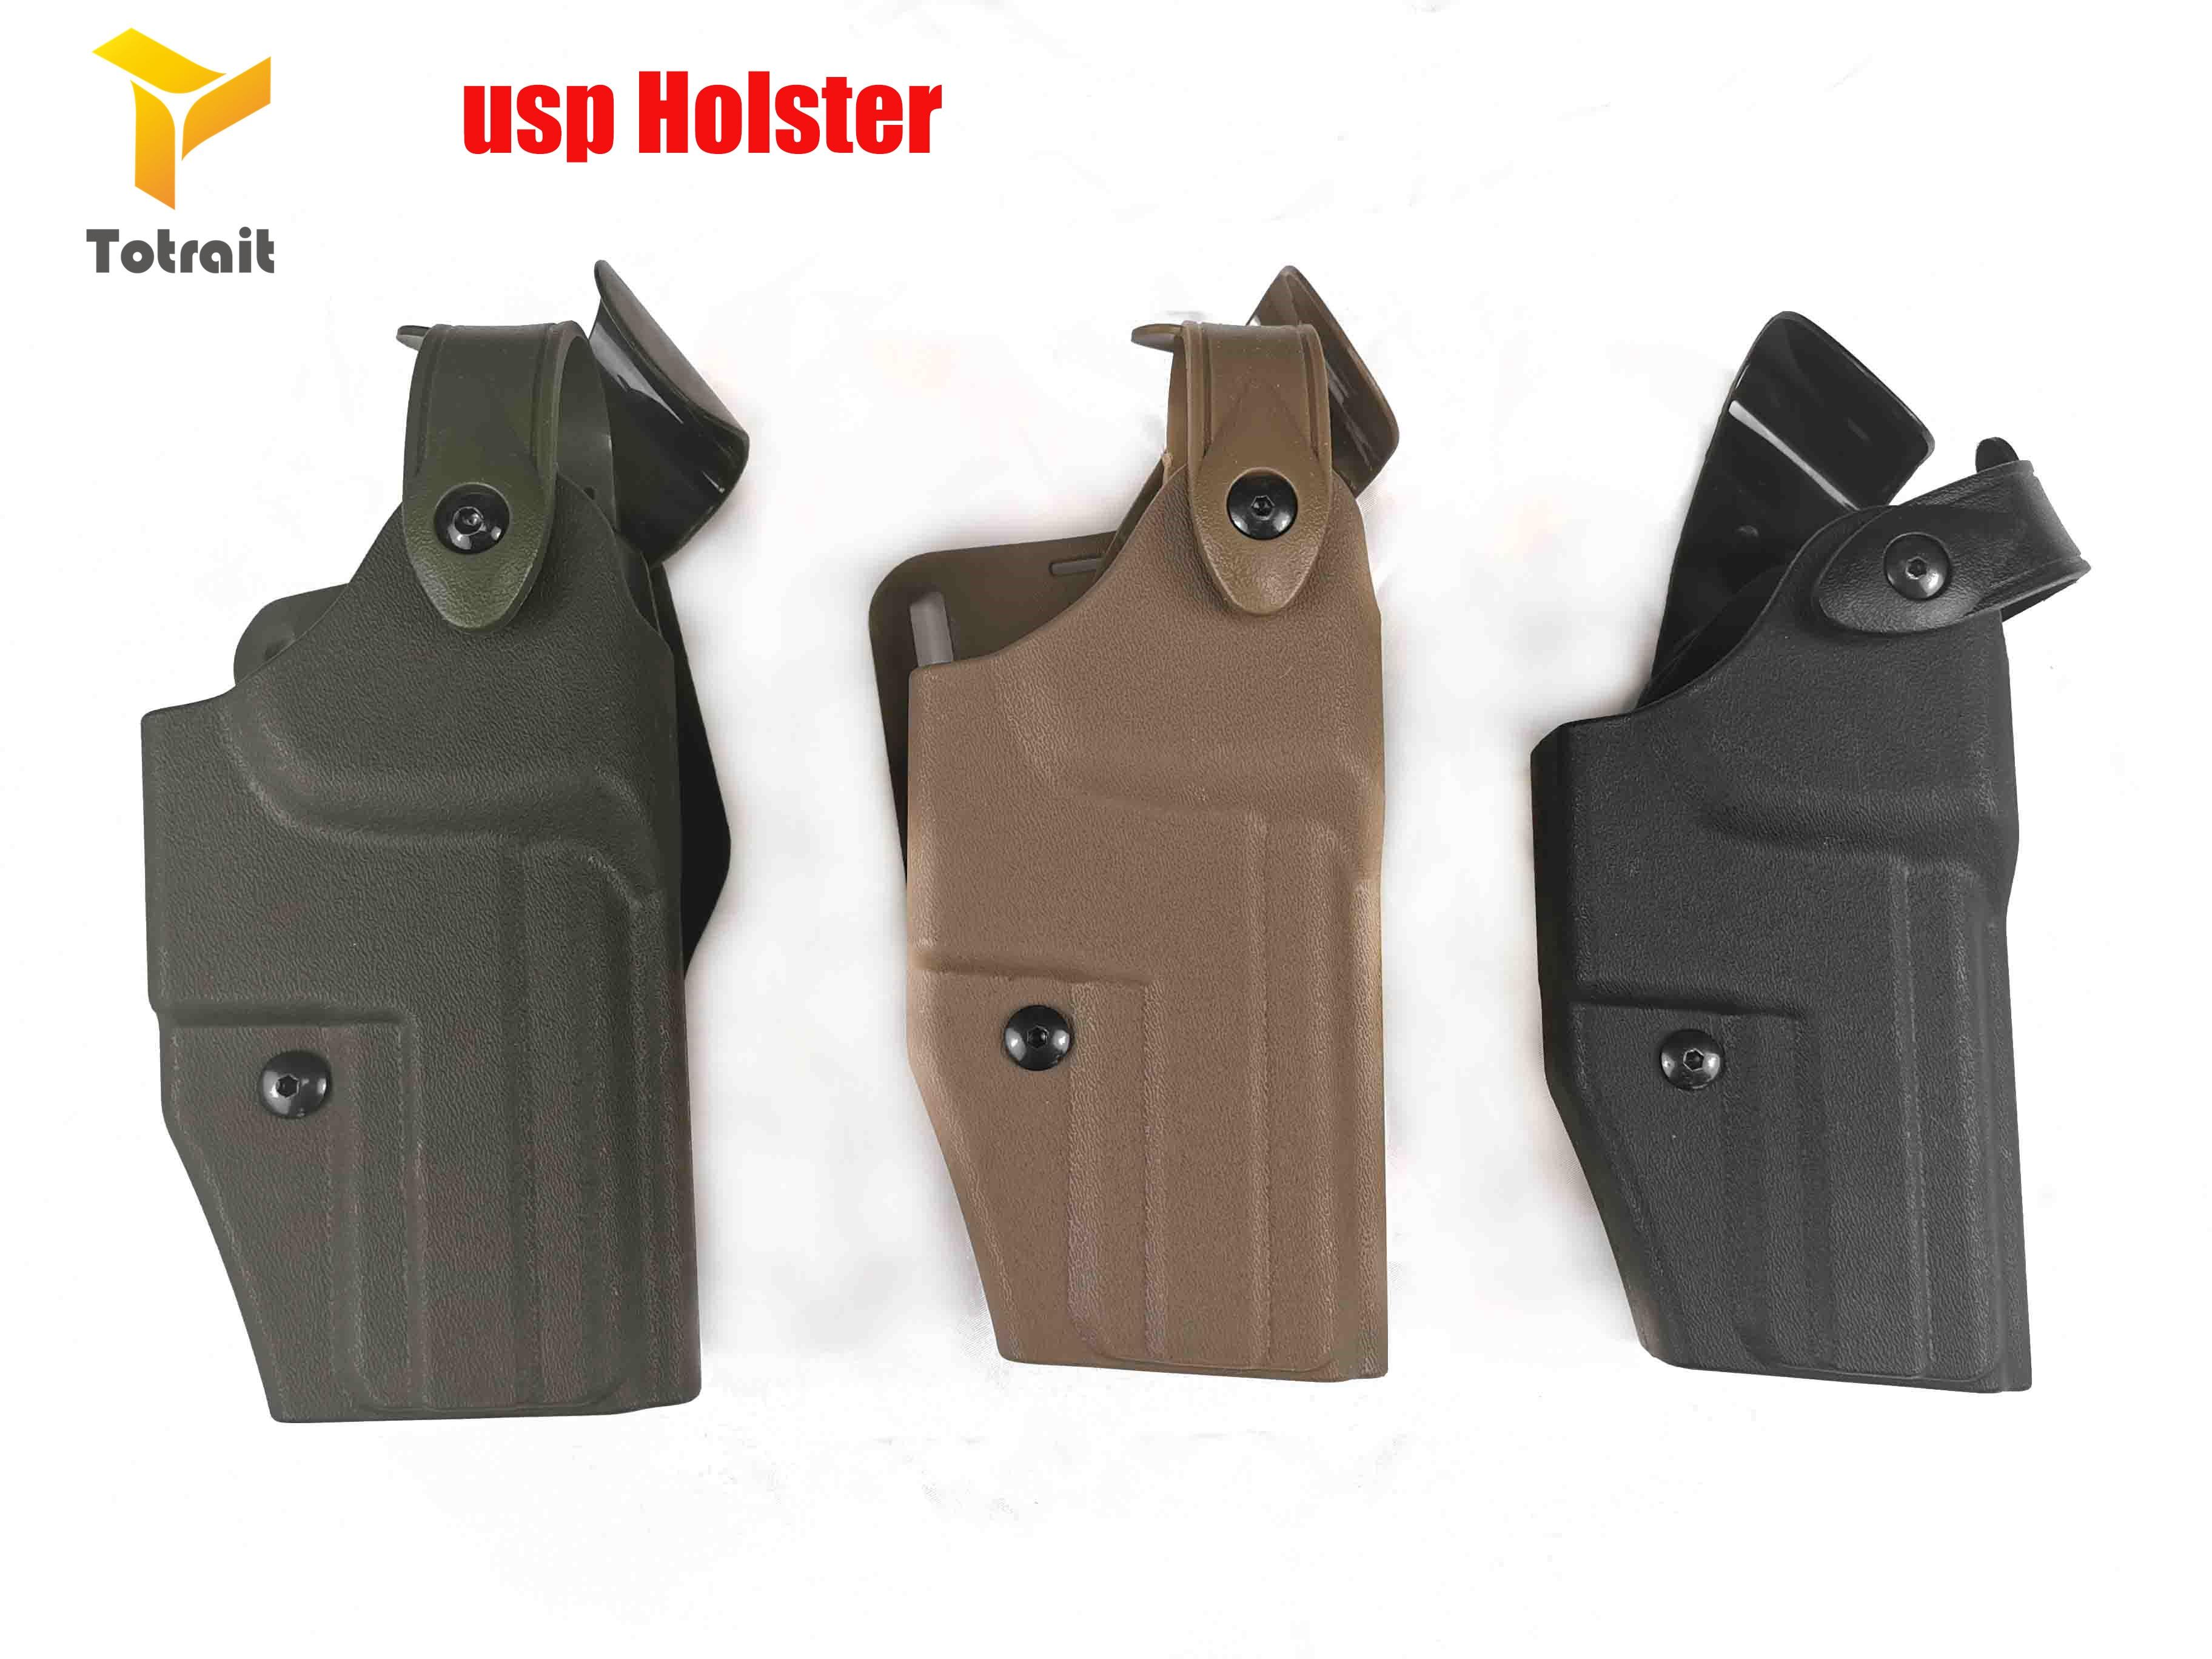 Military Army Tactical HK USP Compact Gun Holster Gun Carry Case Right Hand Quick Drop Gun Belt Holster Hunting Airsoft Gear bla